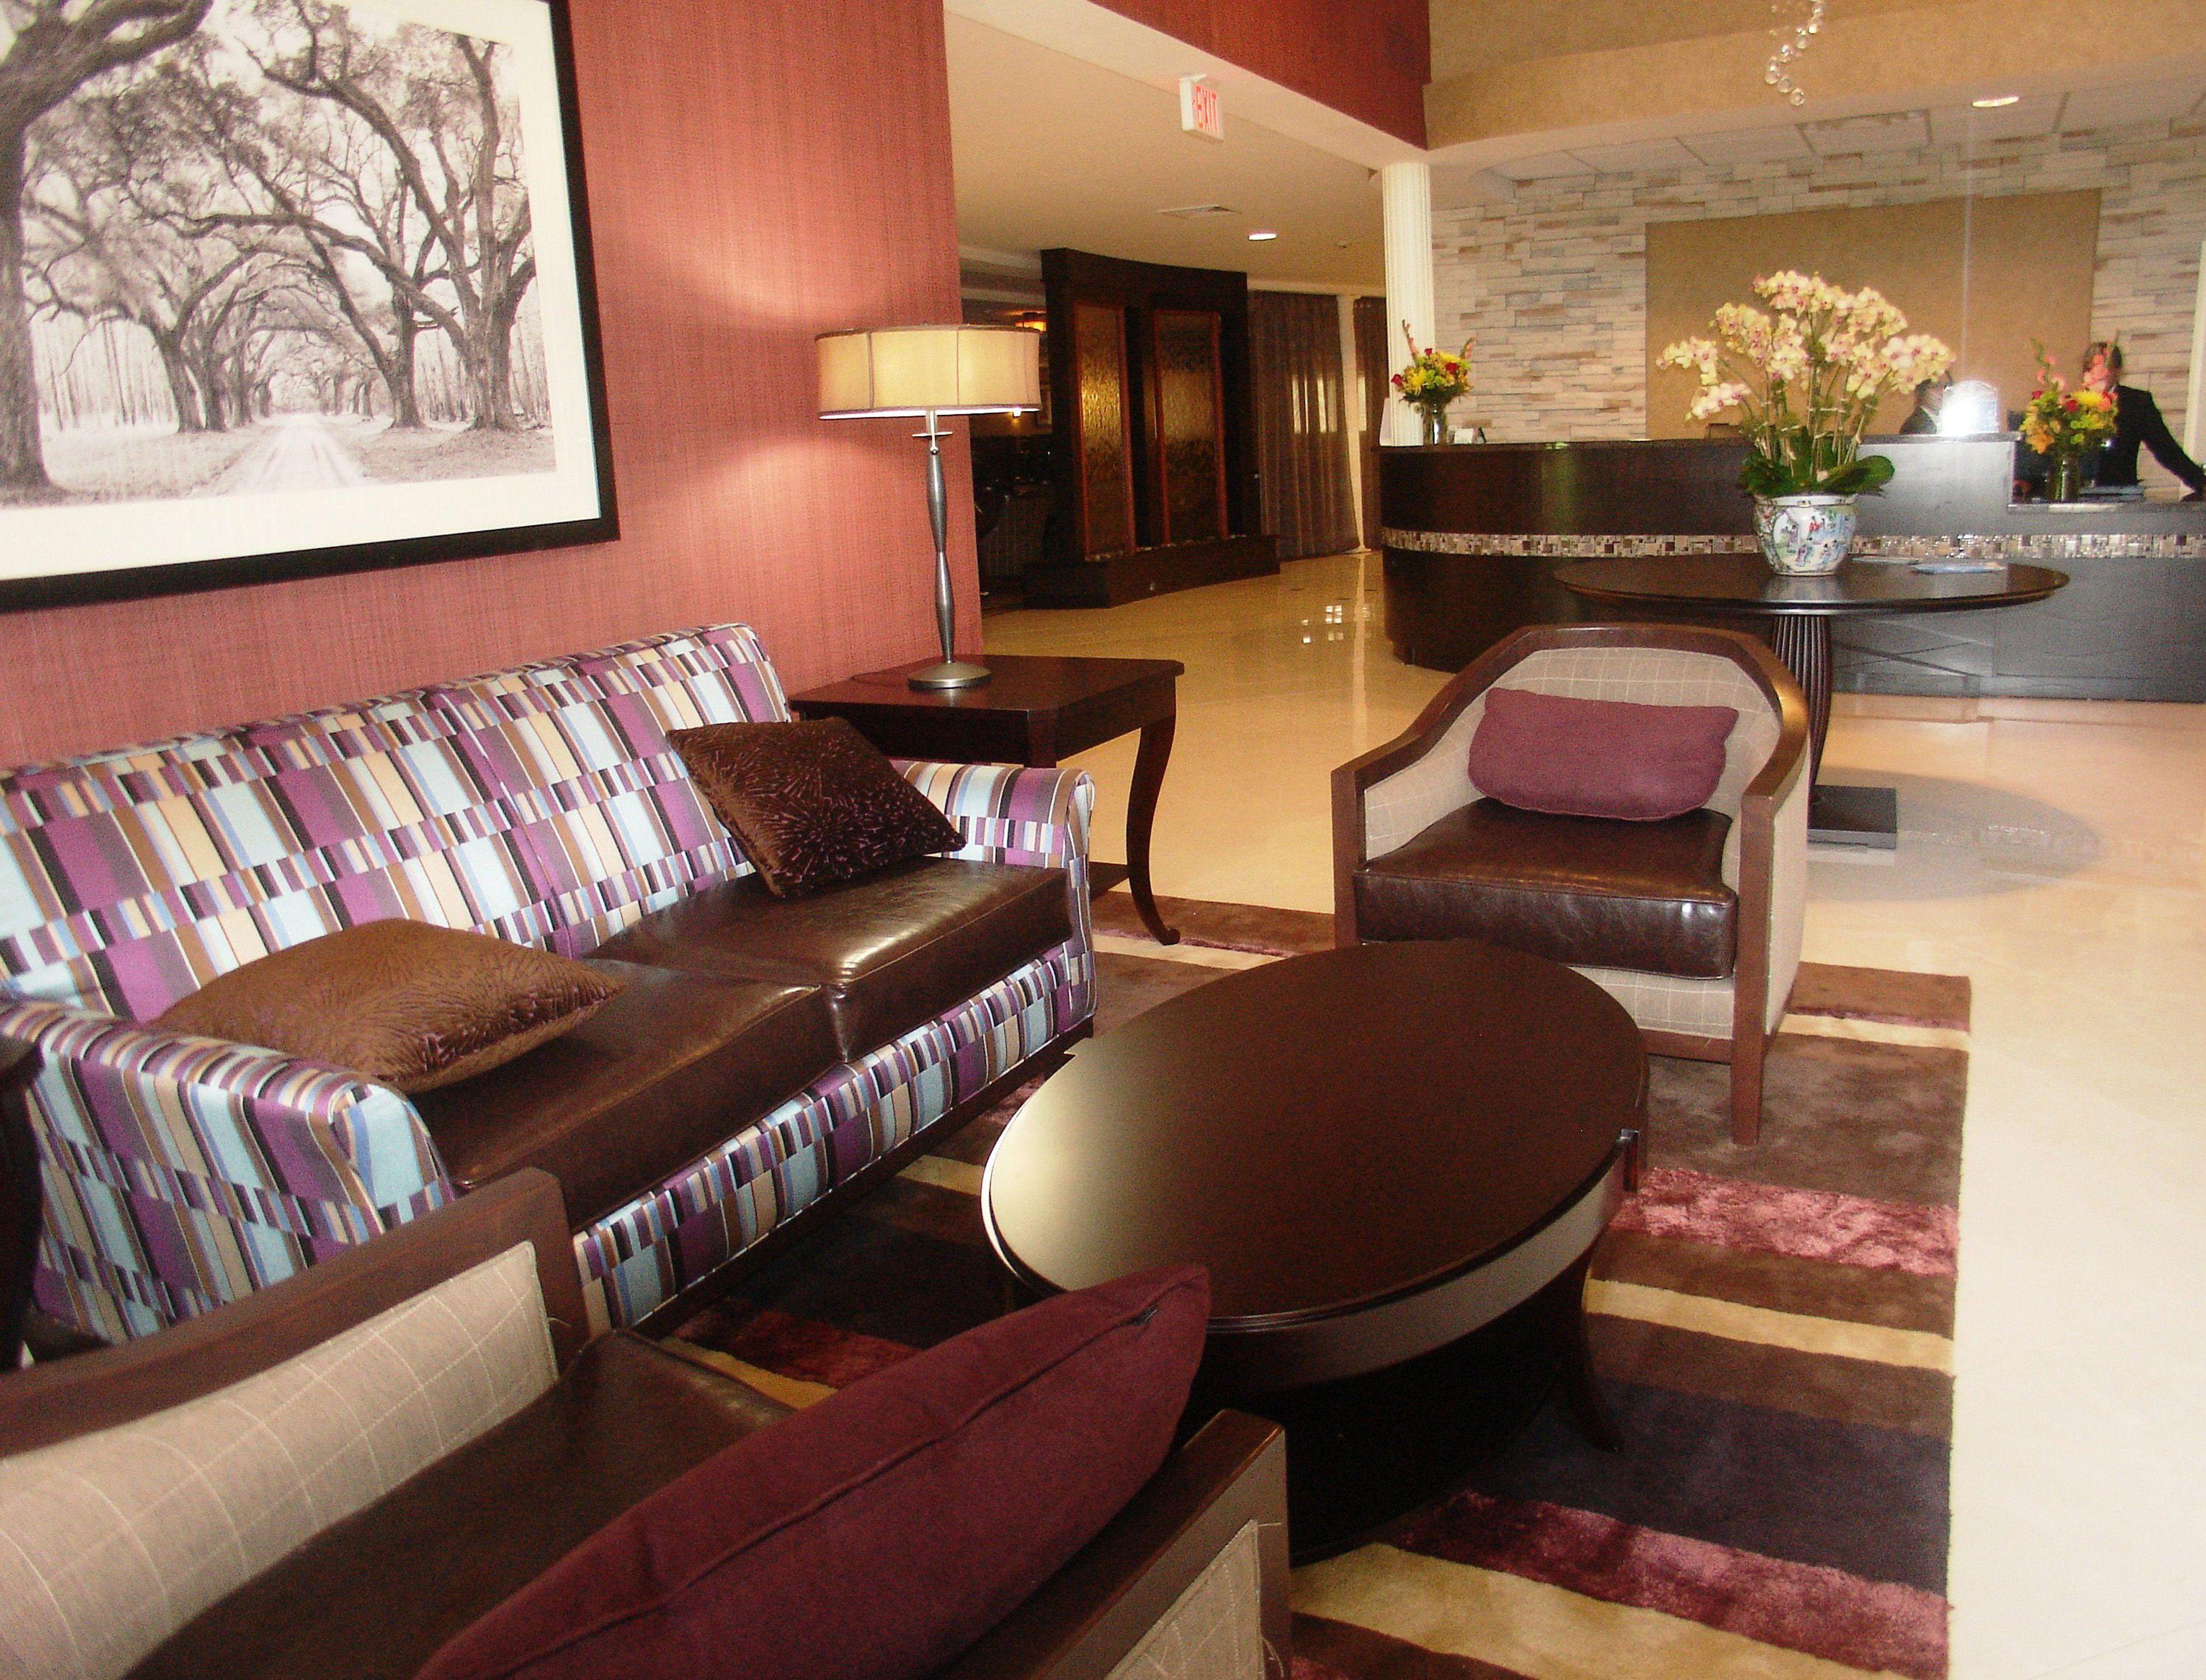 Holiday Inn Orangeburg-Rockland/Bergen Co image 8